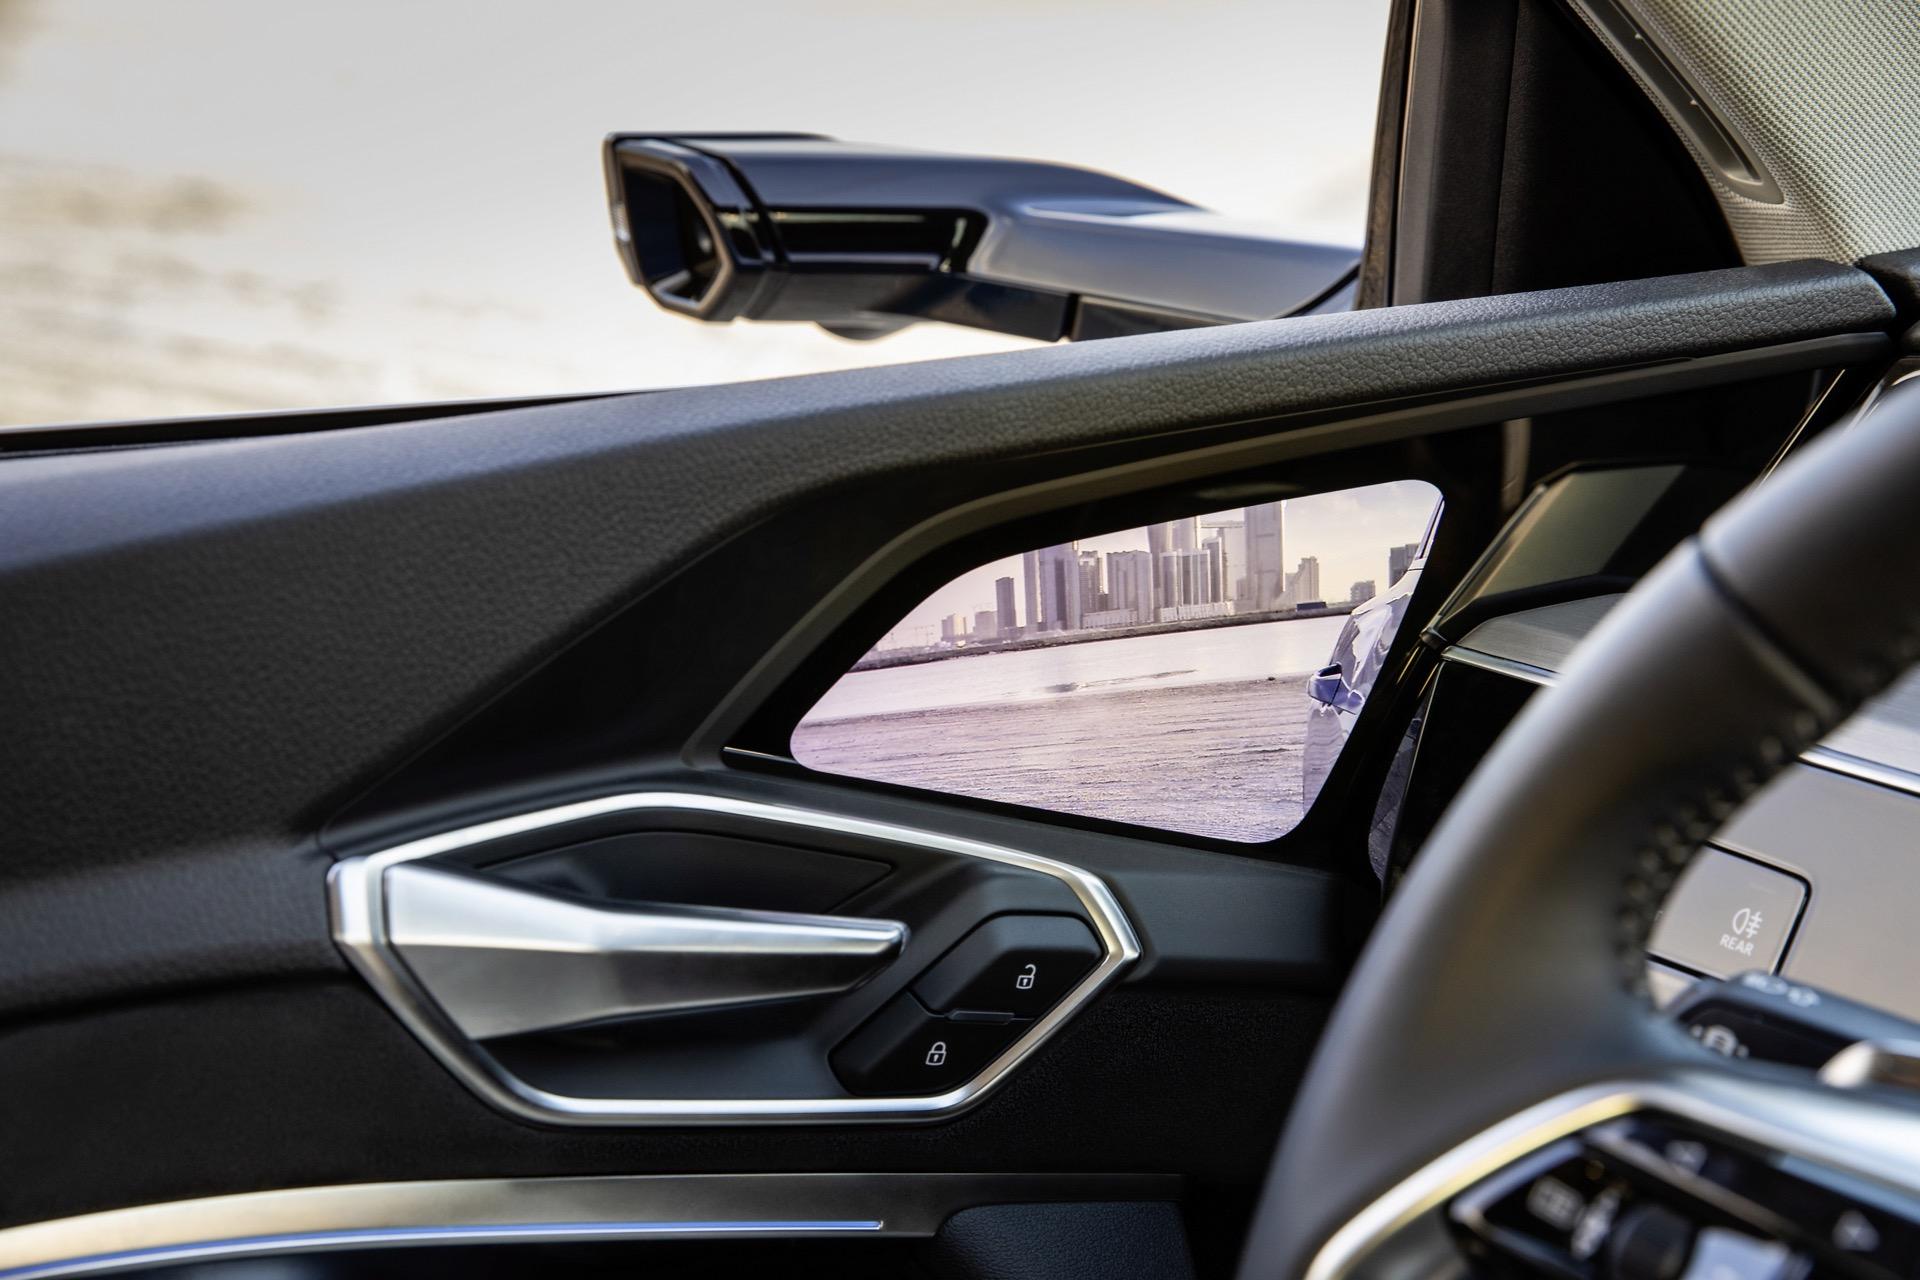 toyota prius awd-e drive, hyundai fuel cells, co2 fines, audi